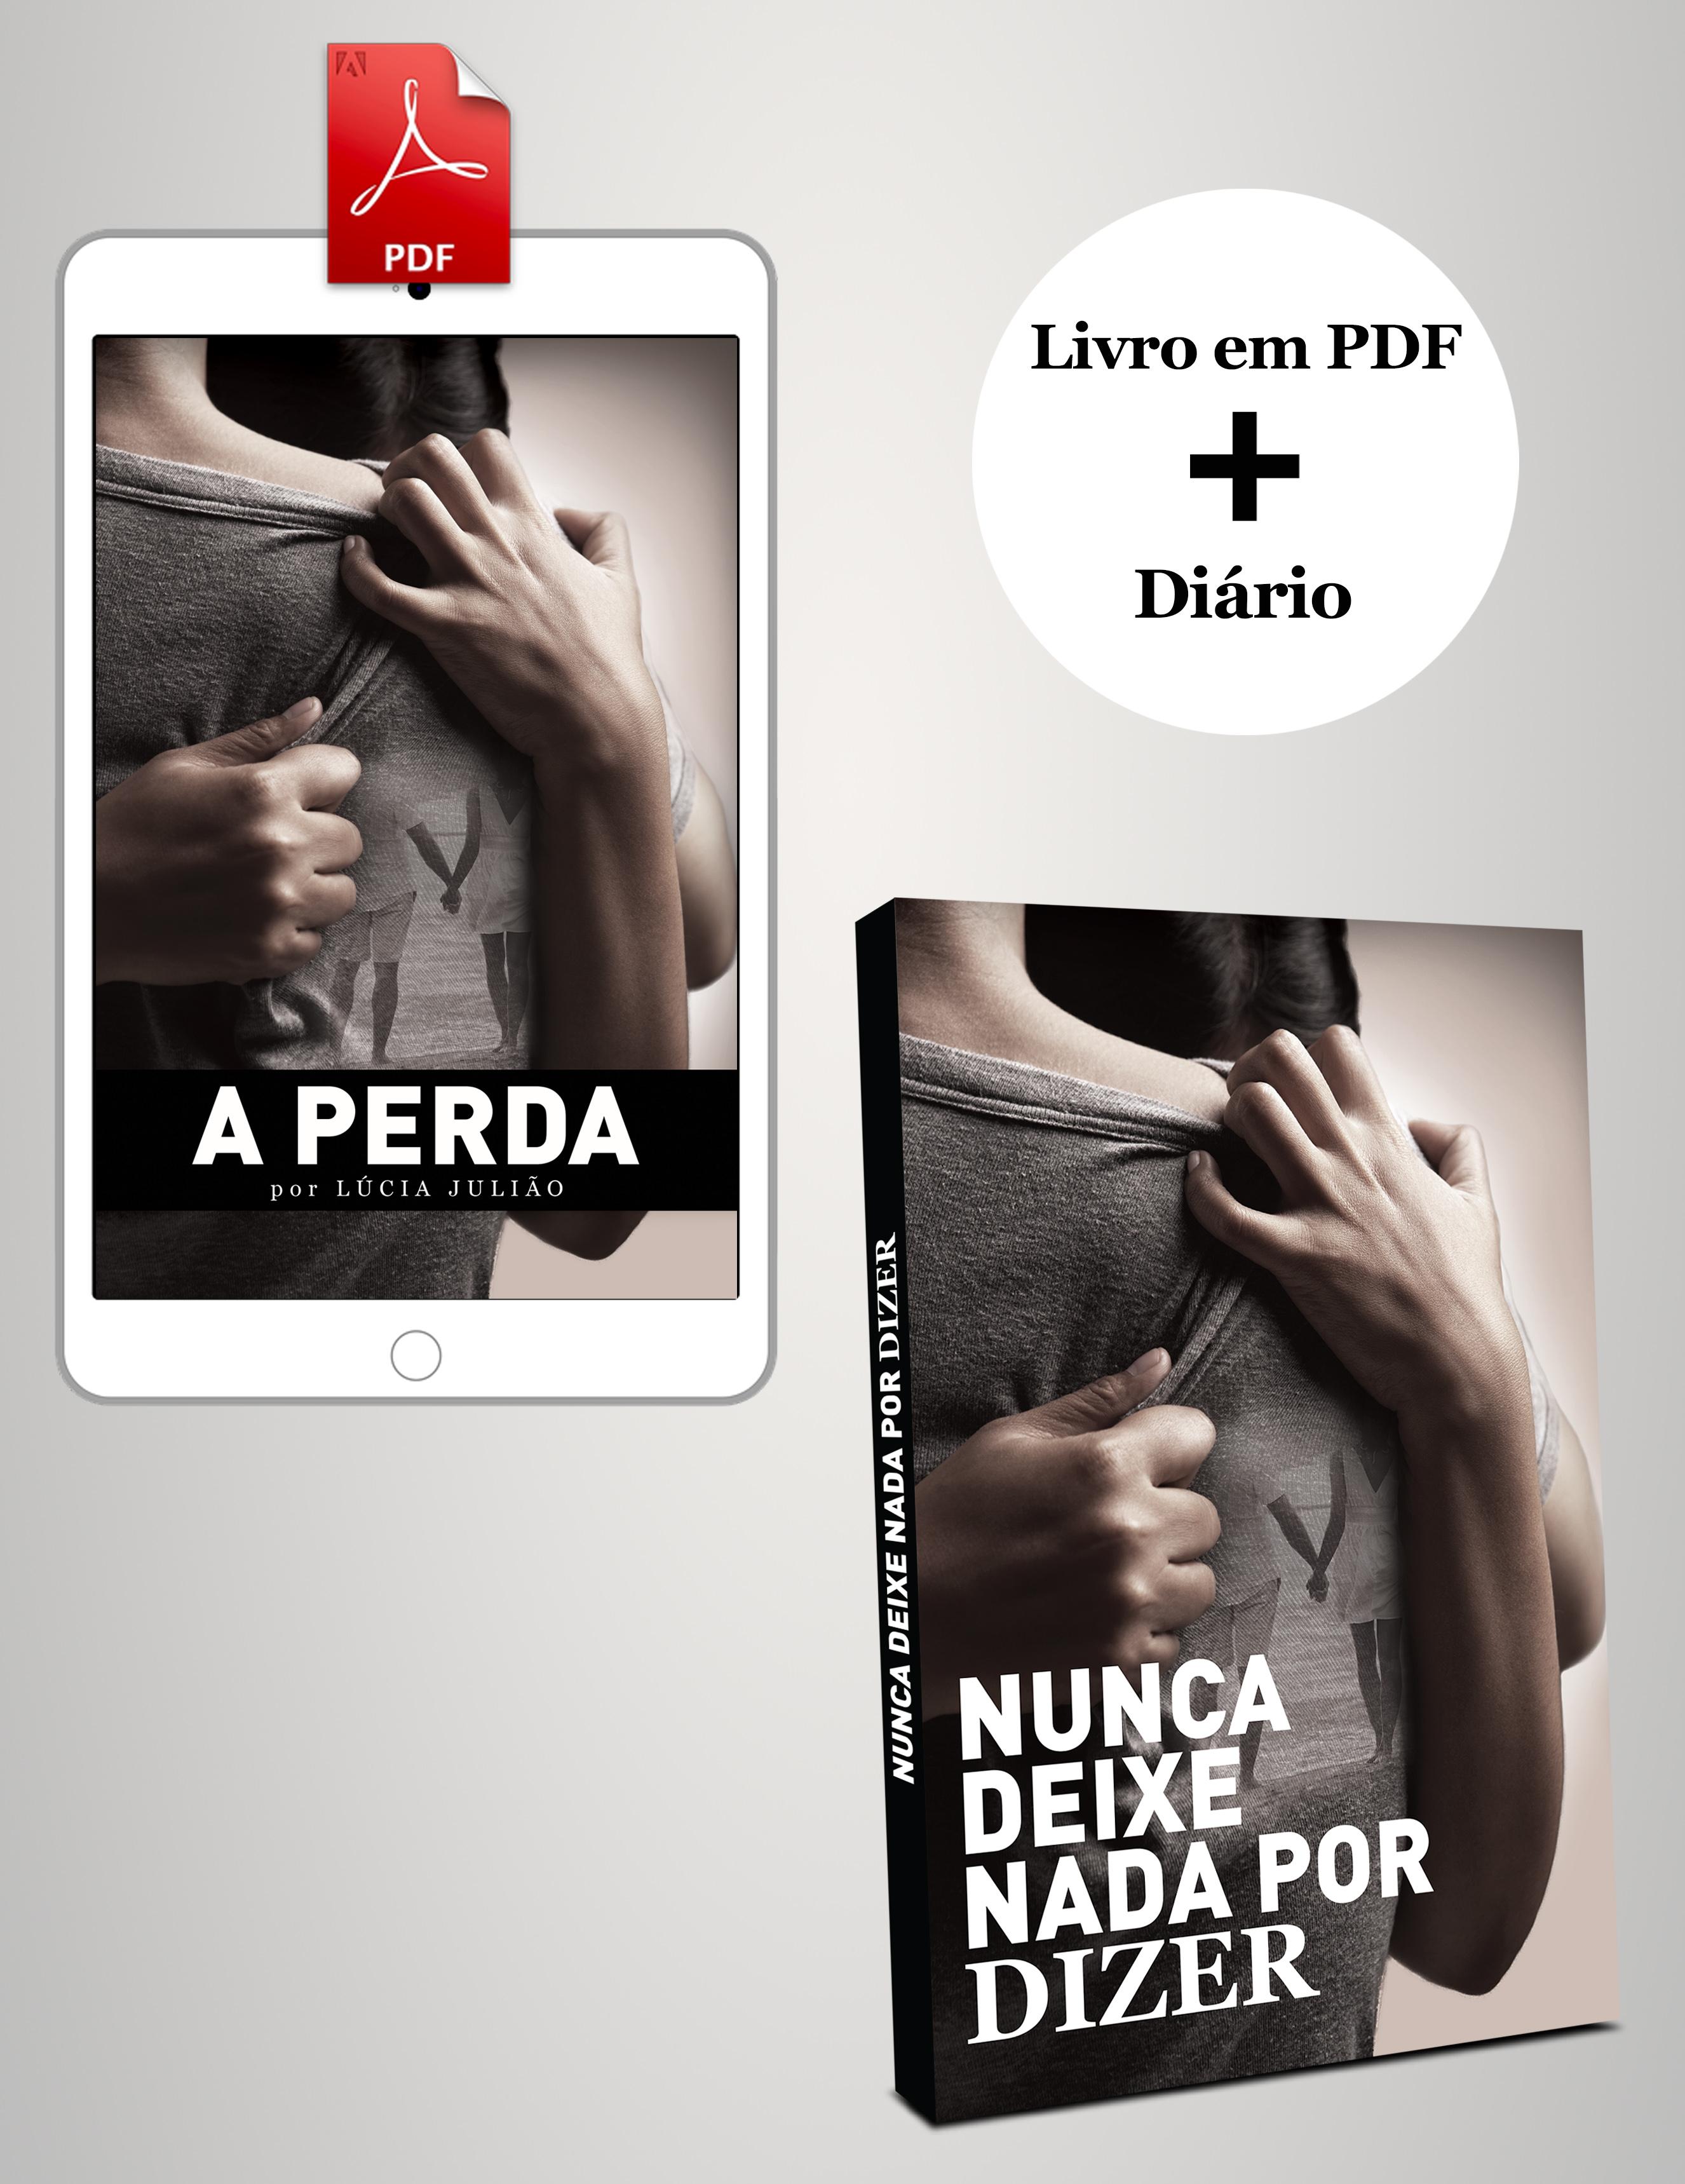 PDF-A-Perda-diario-nunca-deixe-nada-por-dizer-vrt